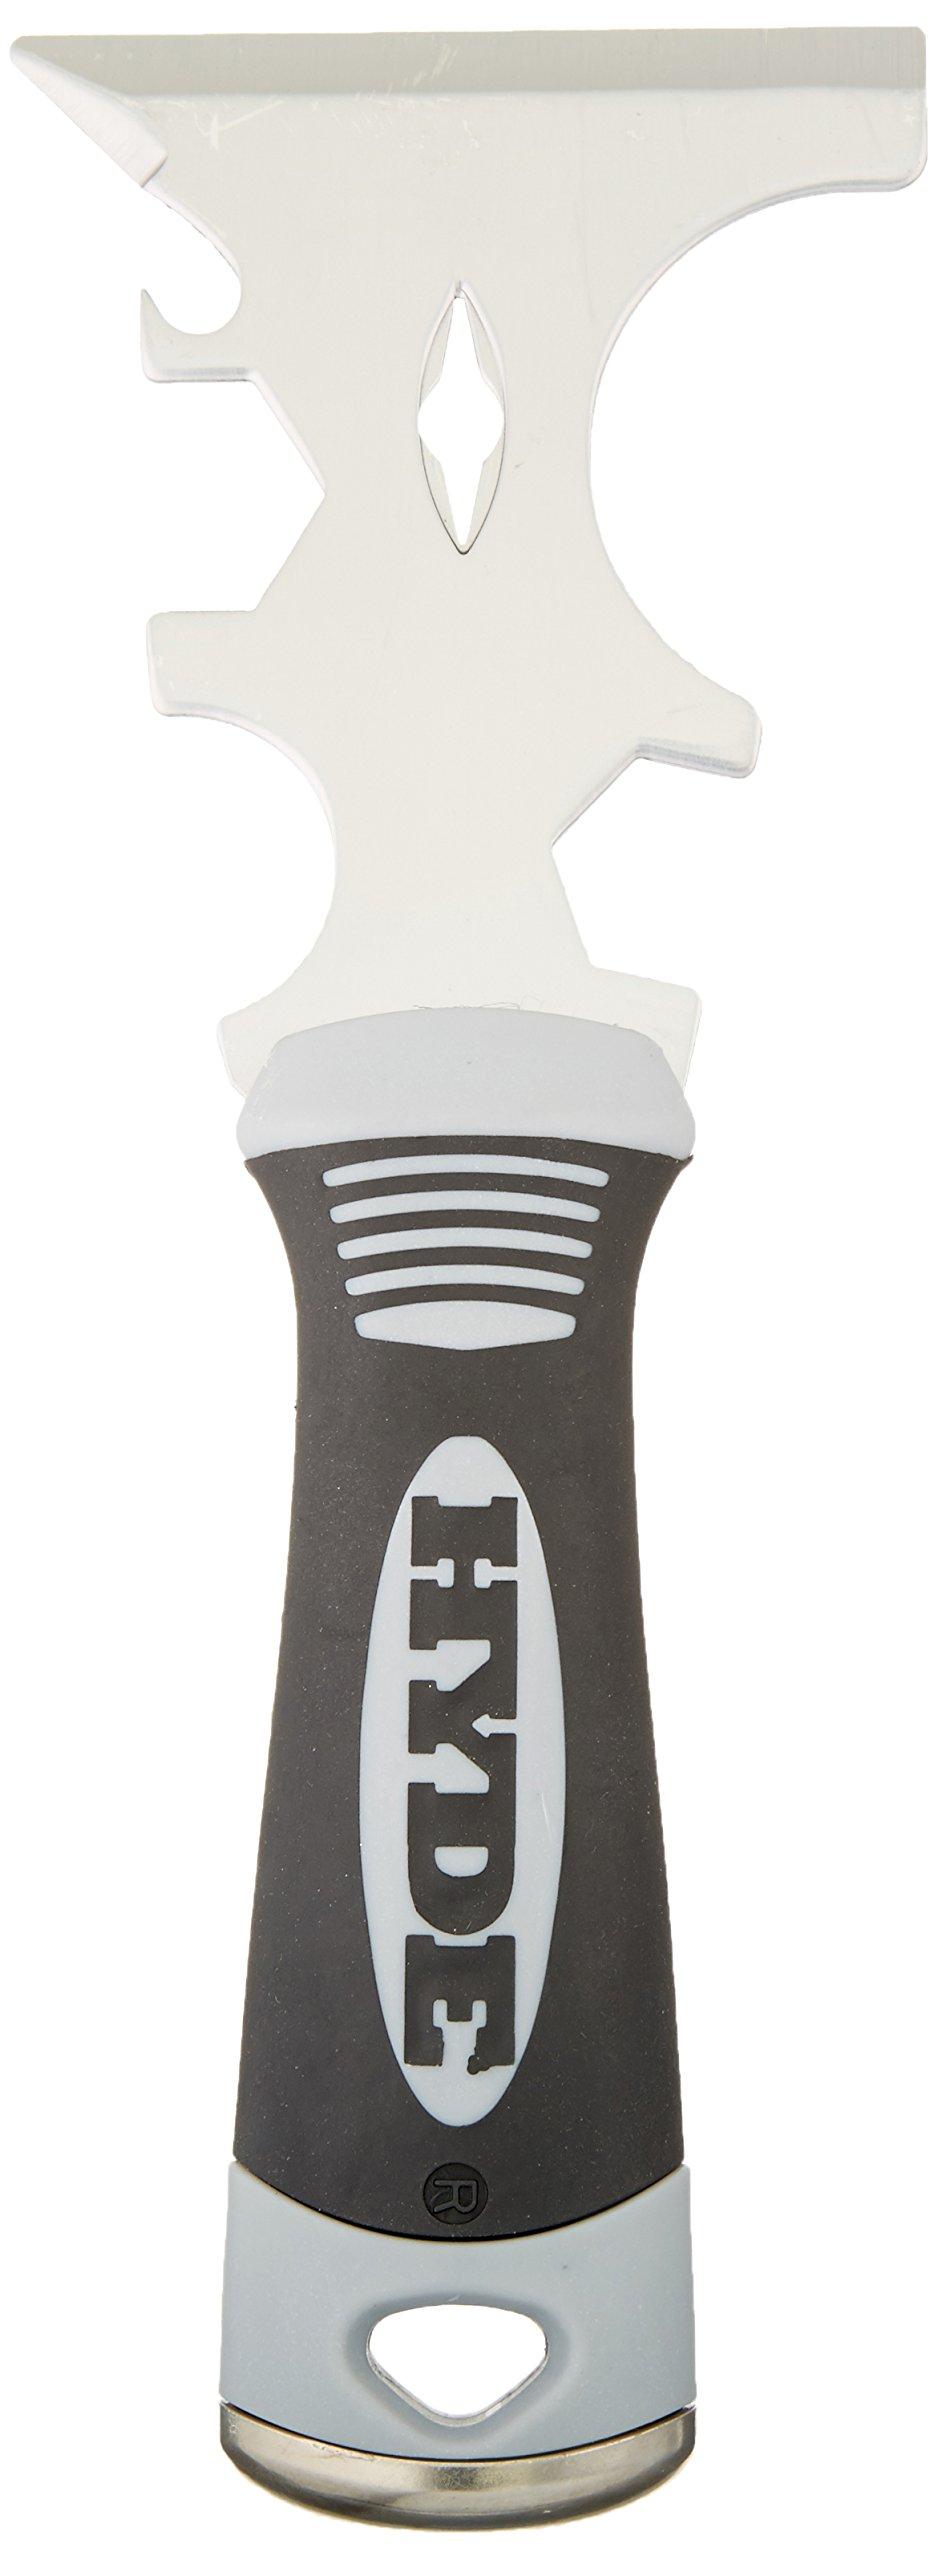 HYDE TOOLS 209651 17 in 1 Painters Multi Tool